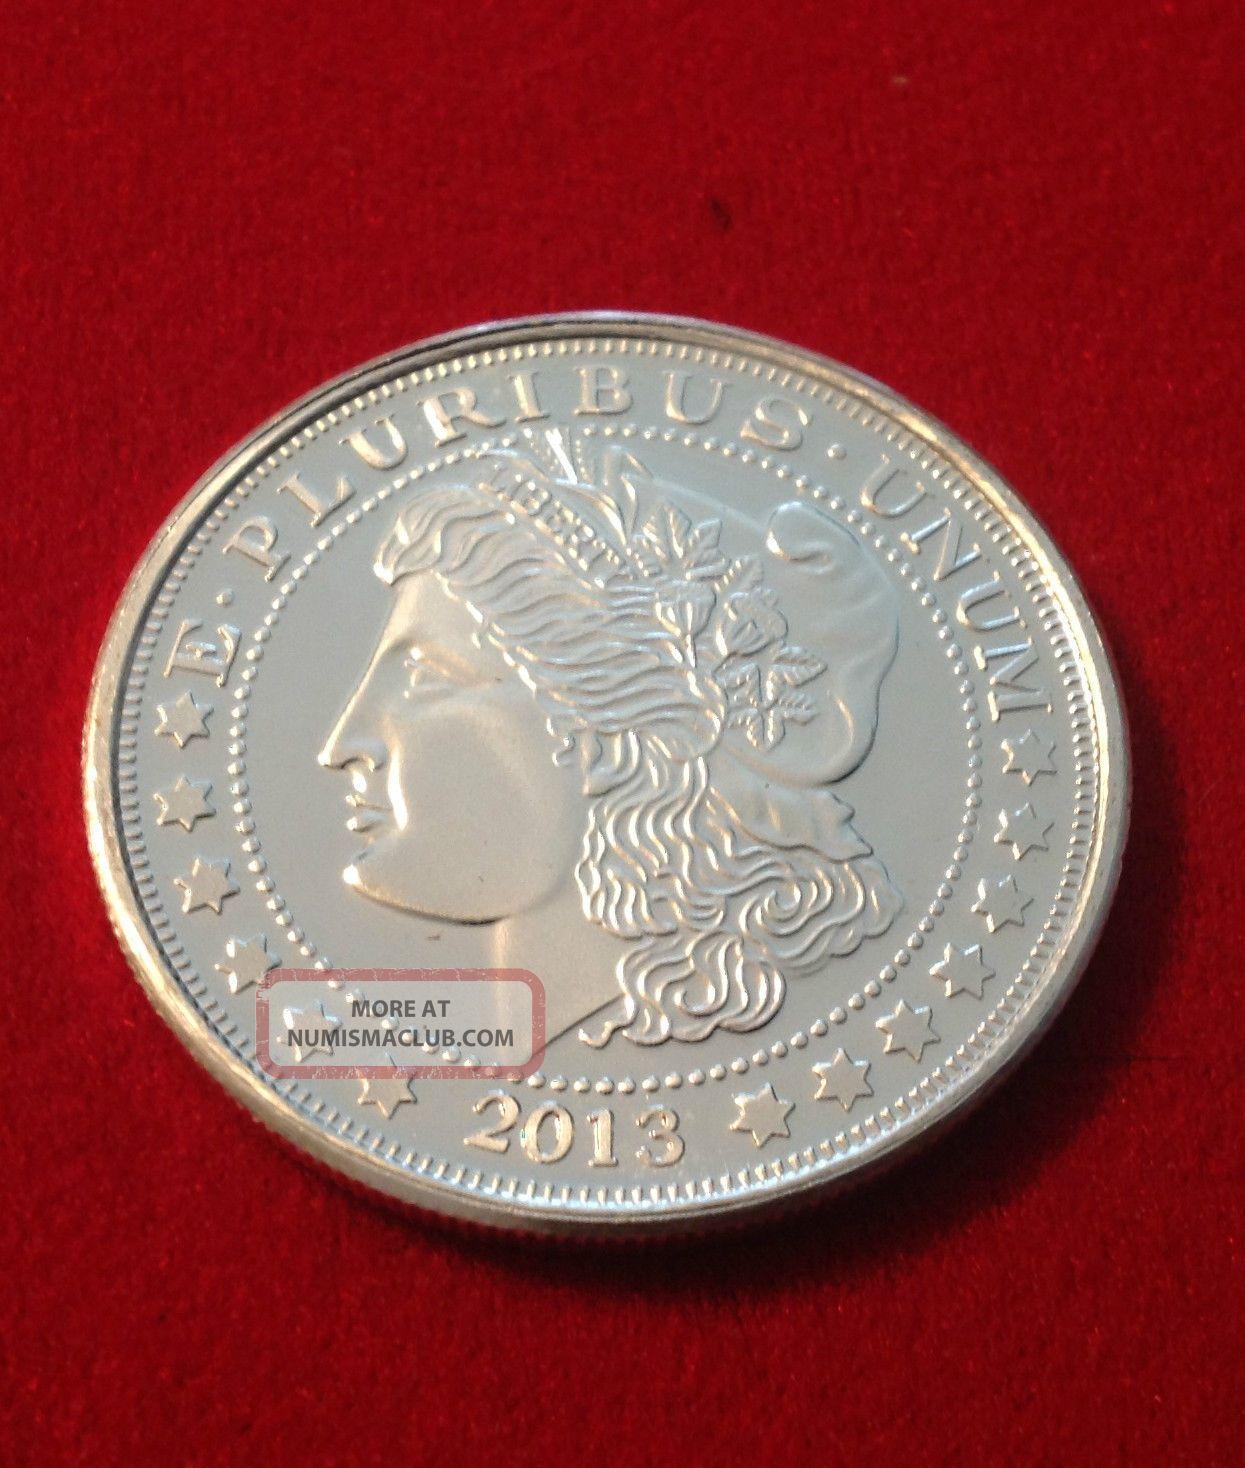 1 Troy Ounce Morgan Dollar Replica Coin Medallion -.  999 Fine Pure Silver Paper Money: US photo